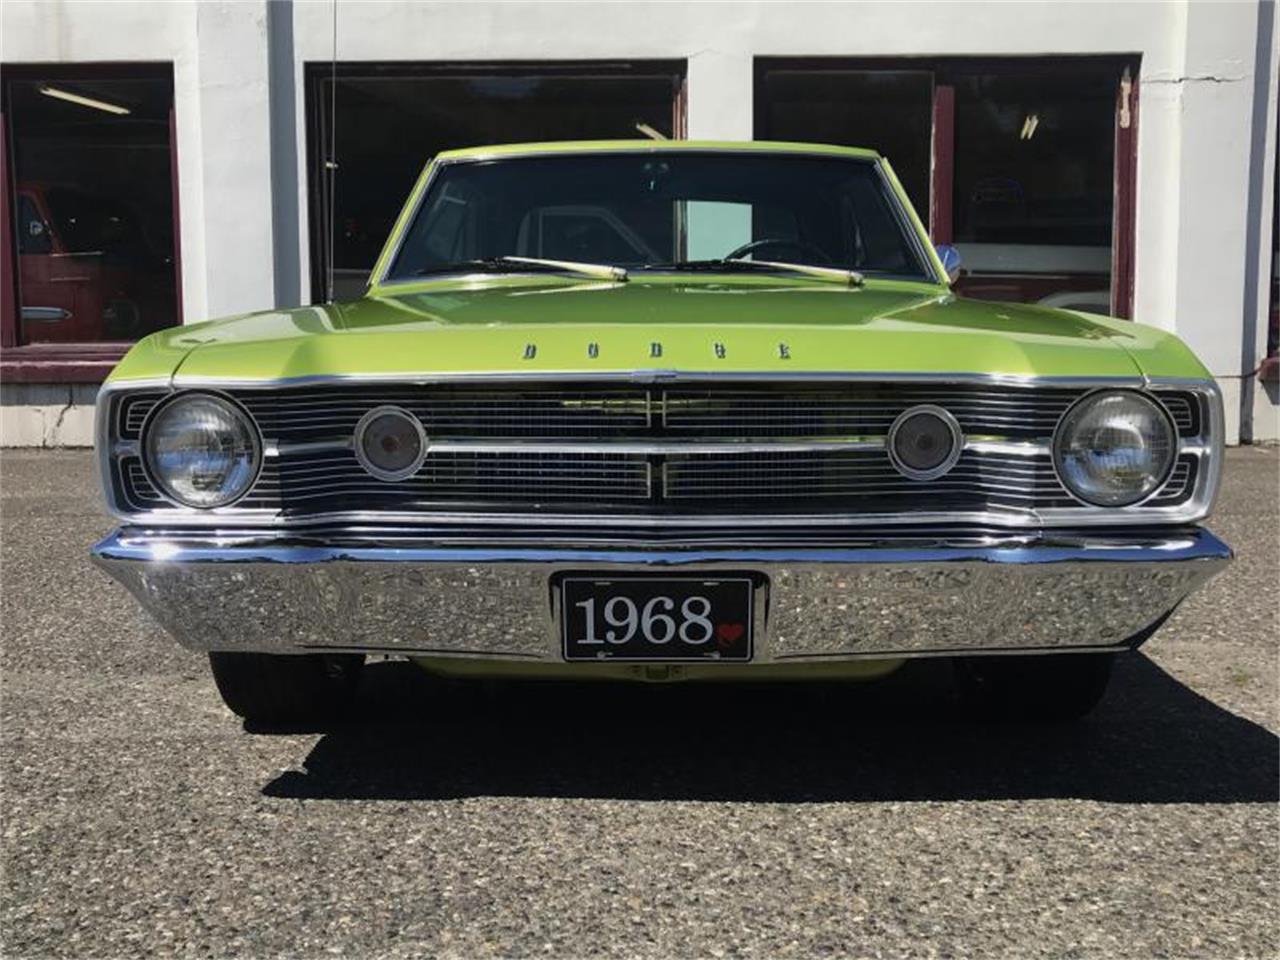 1968 Dodge Dart For Sale In Tocoma Wa Classiccarsbay Com